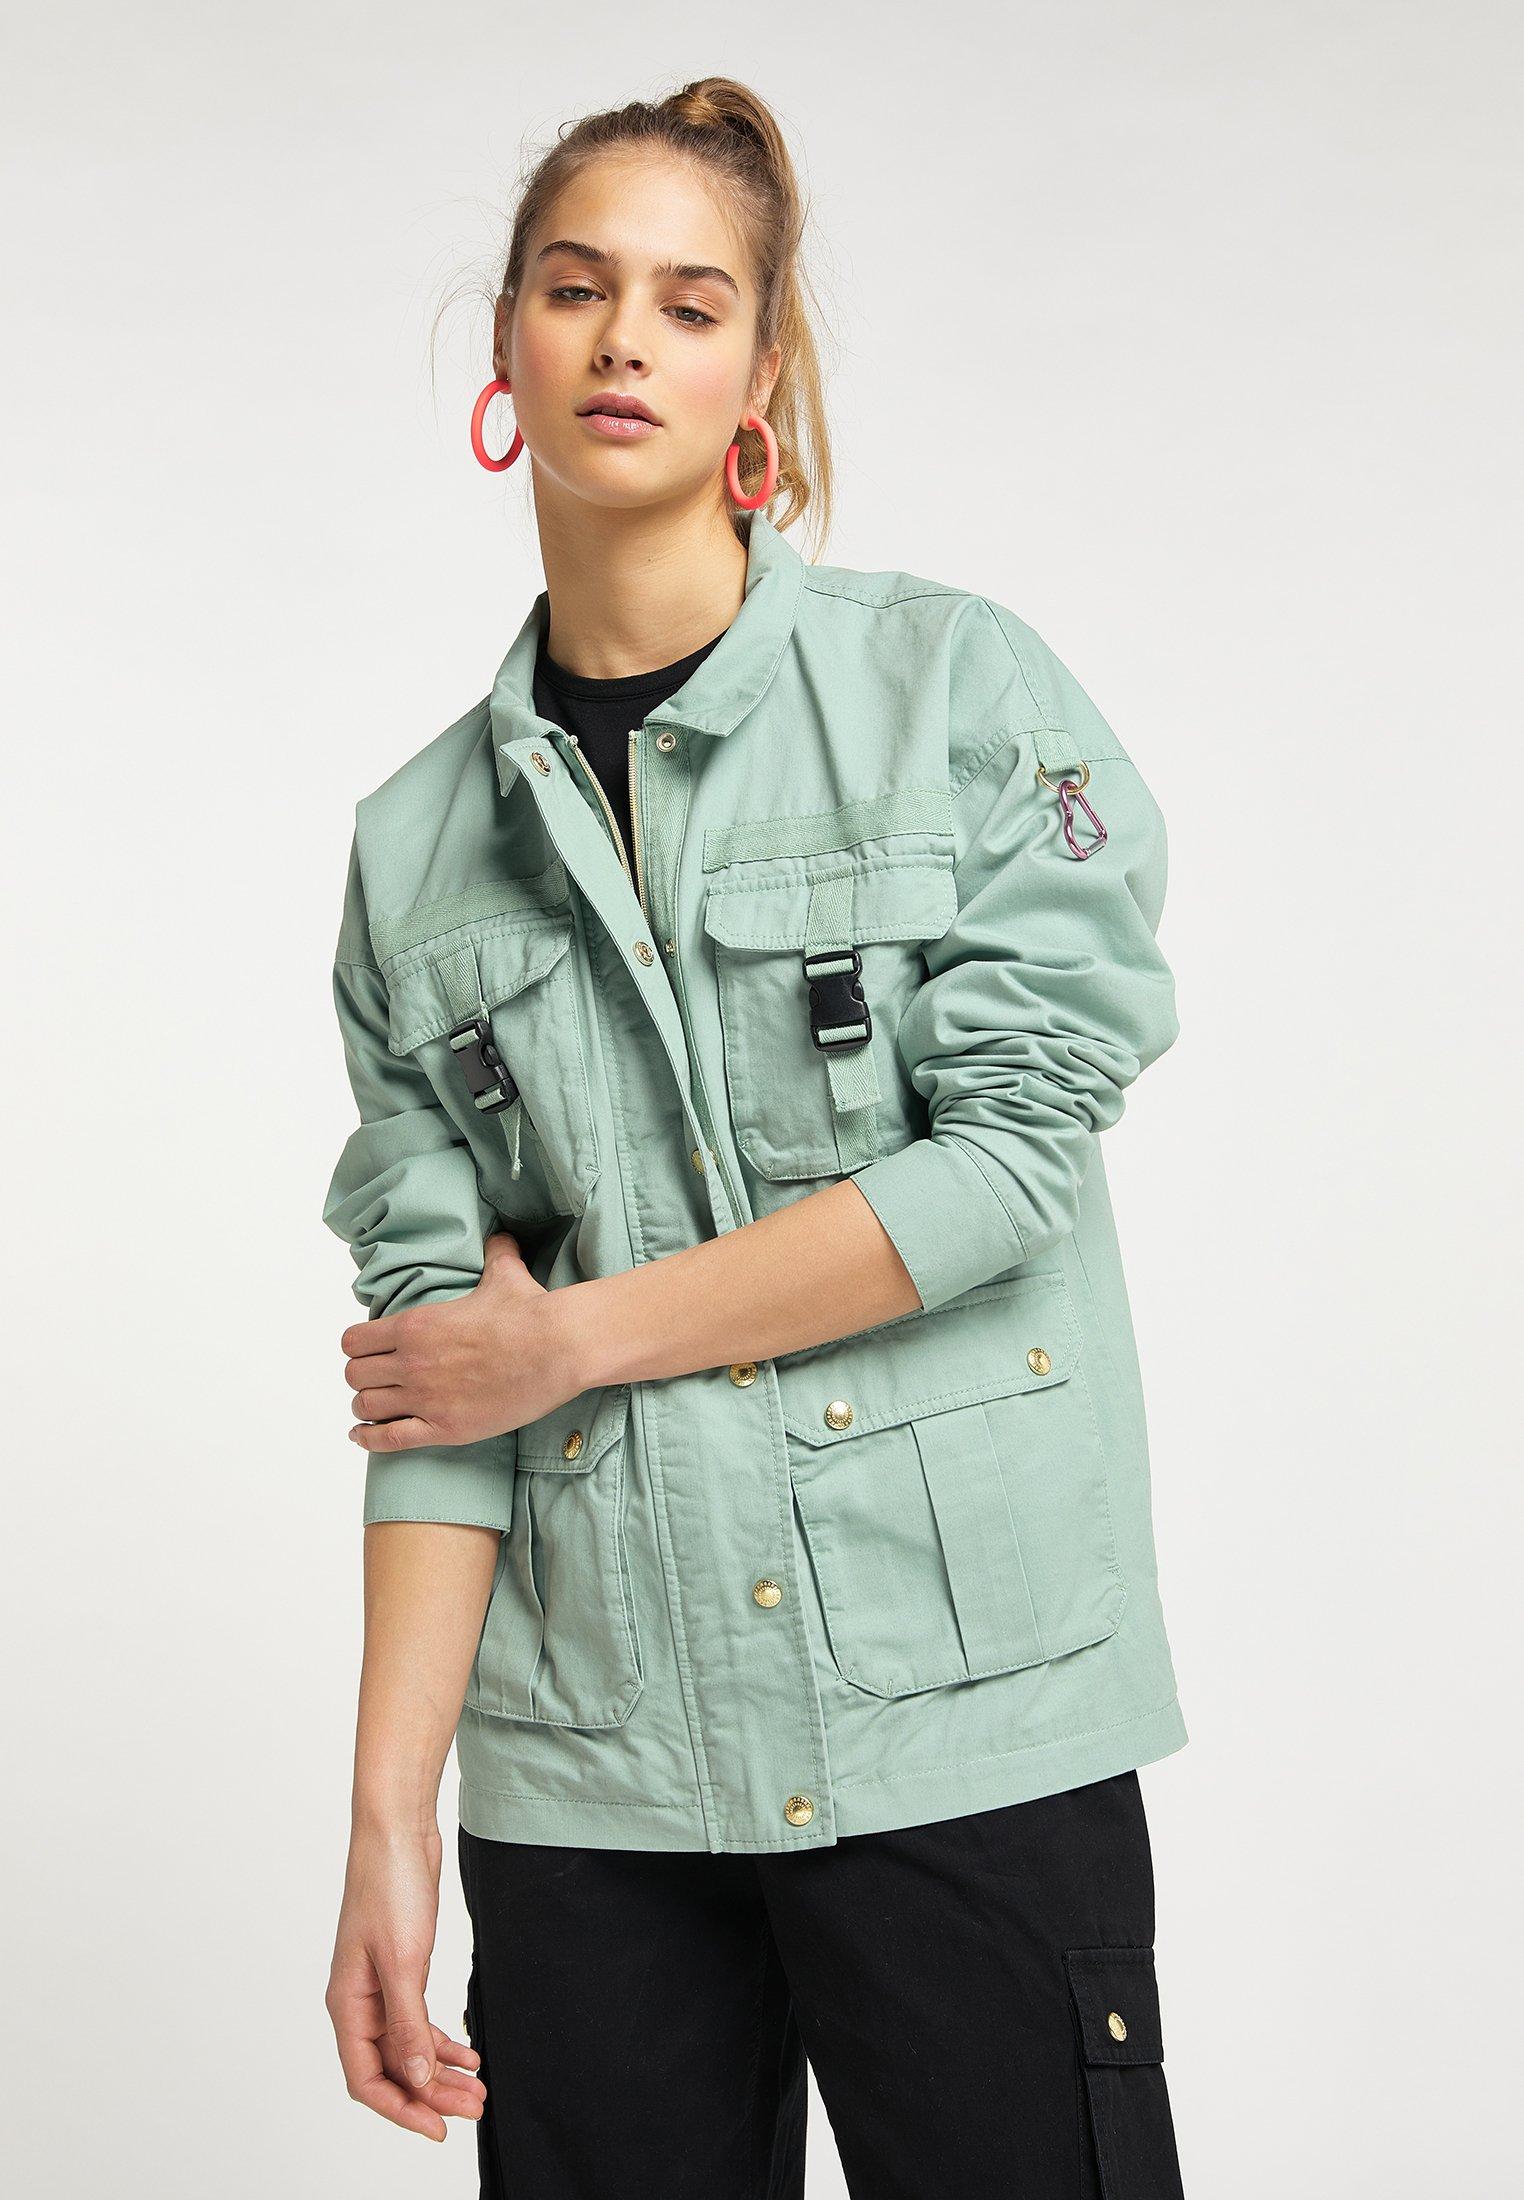 2020 Newest Women's Clothing myMo Summer jacket neo mint 9oNTAy5UO